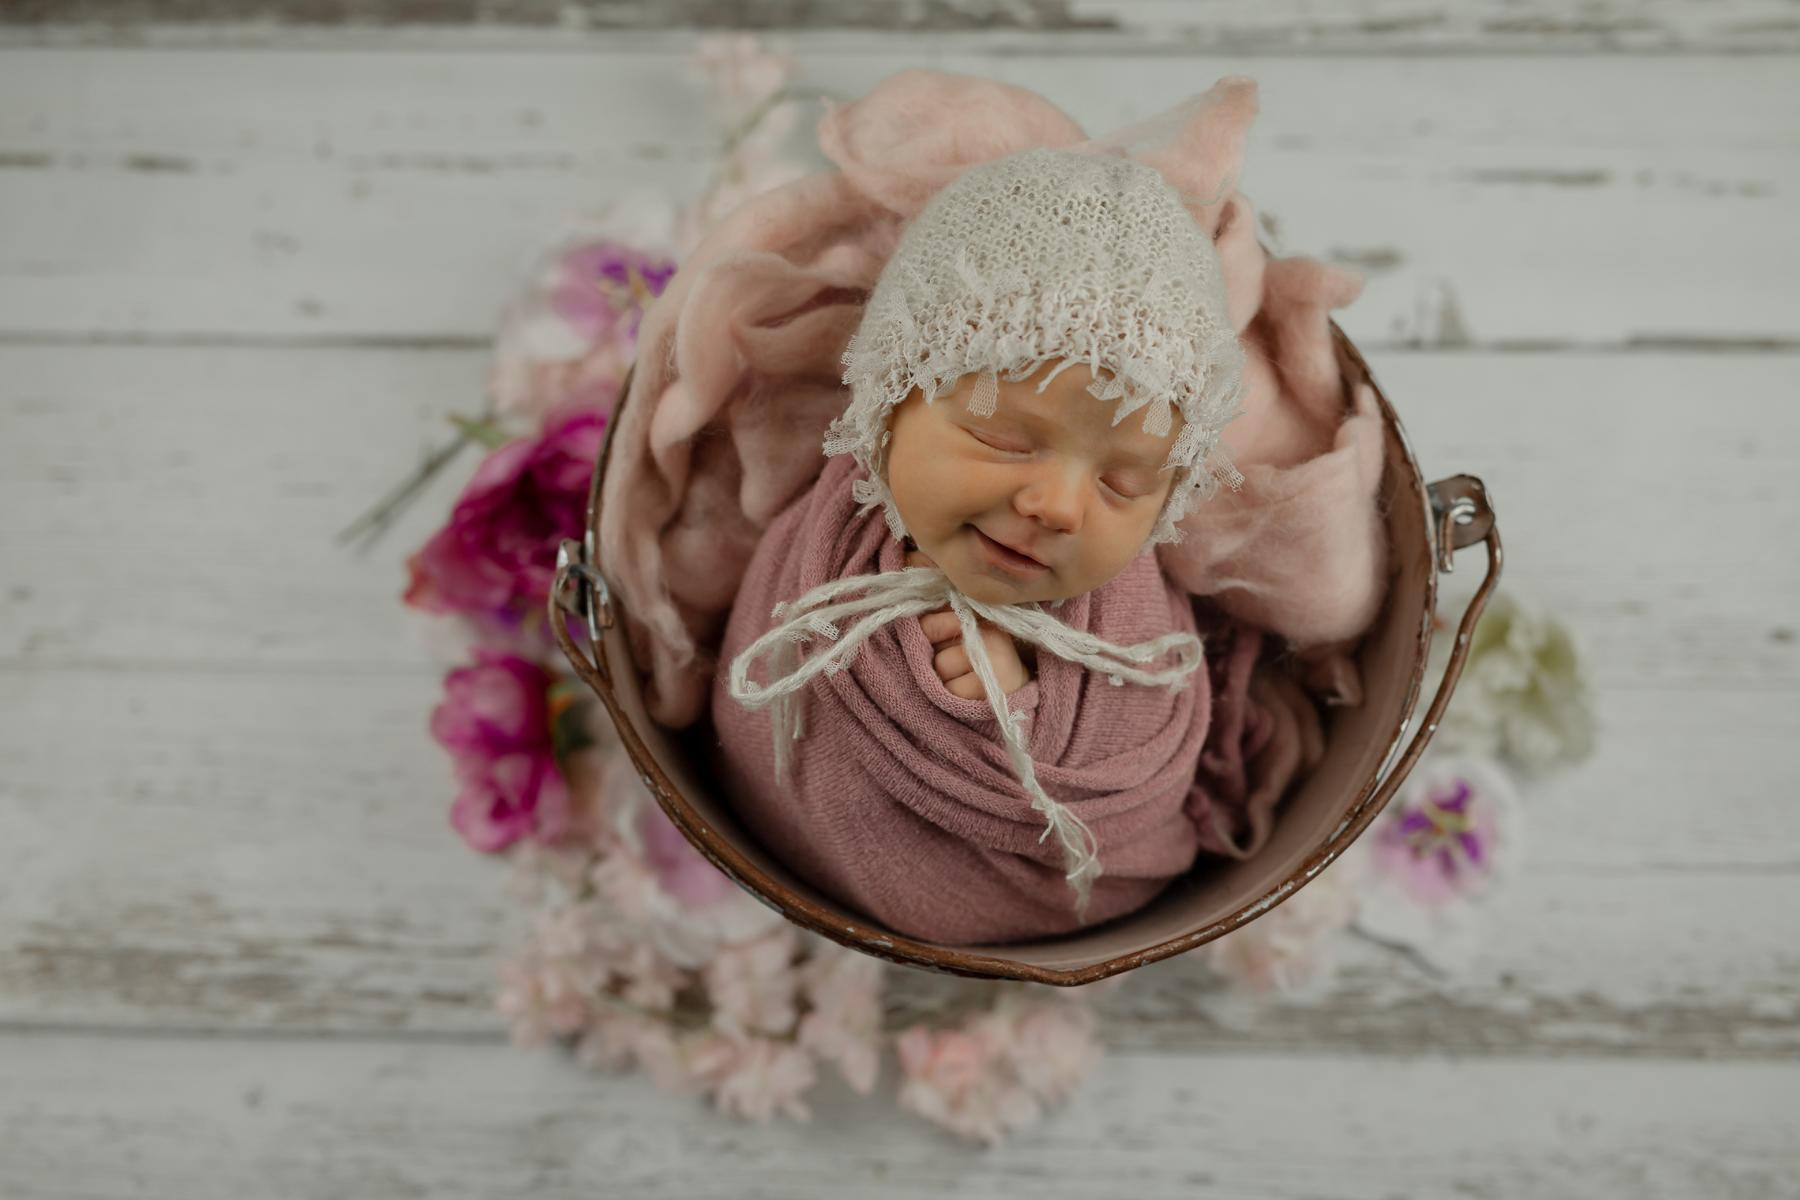 Babyfotografin Rotenburg Wümme | Baby Fotoshooting Schneverdingen | Kinderfotograf Visselhövede | Neugeborenenfotografie Bad Fallingbostel | Fotoshooting Baby